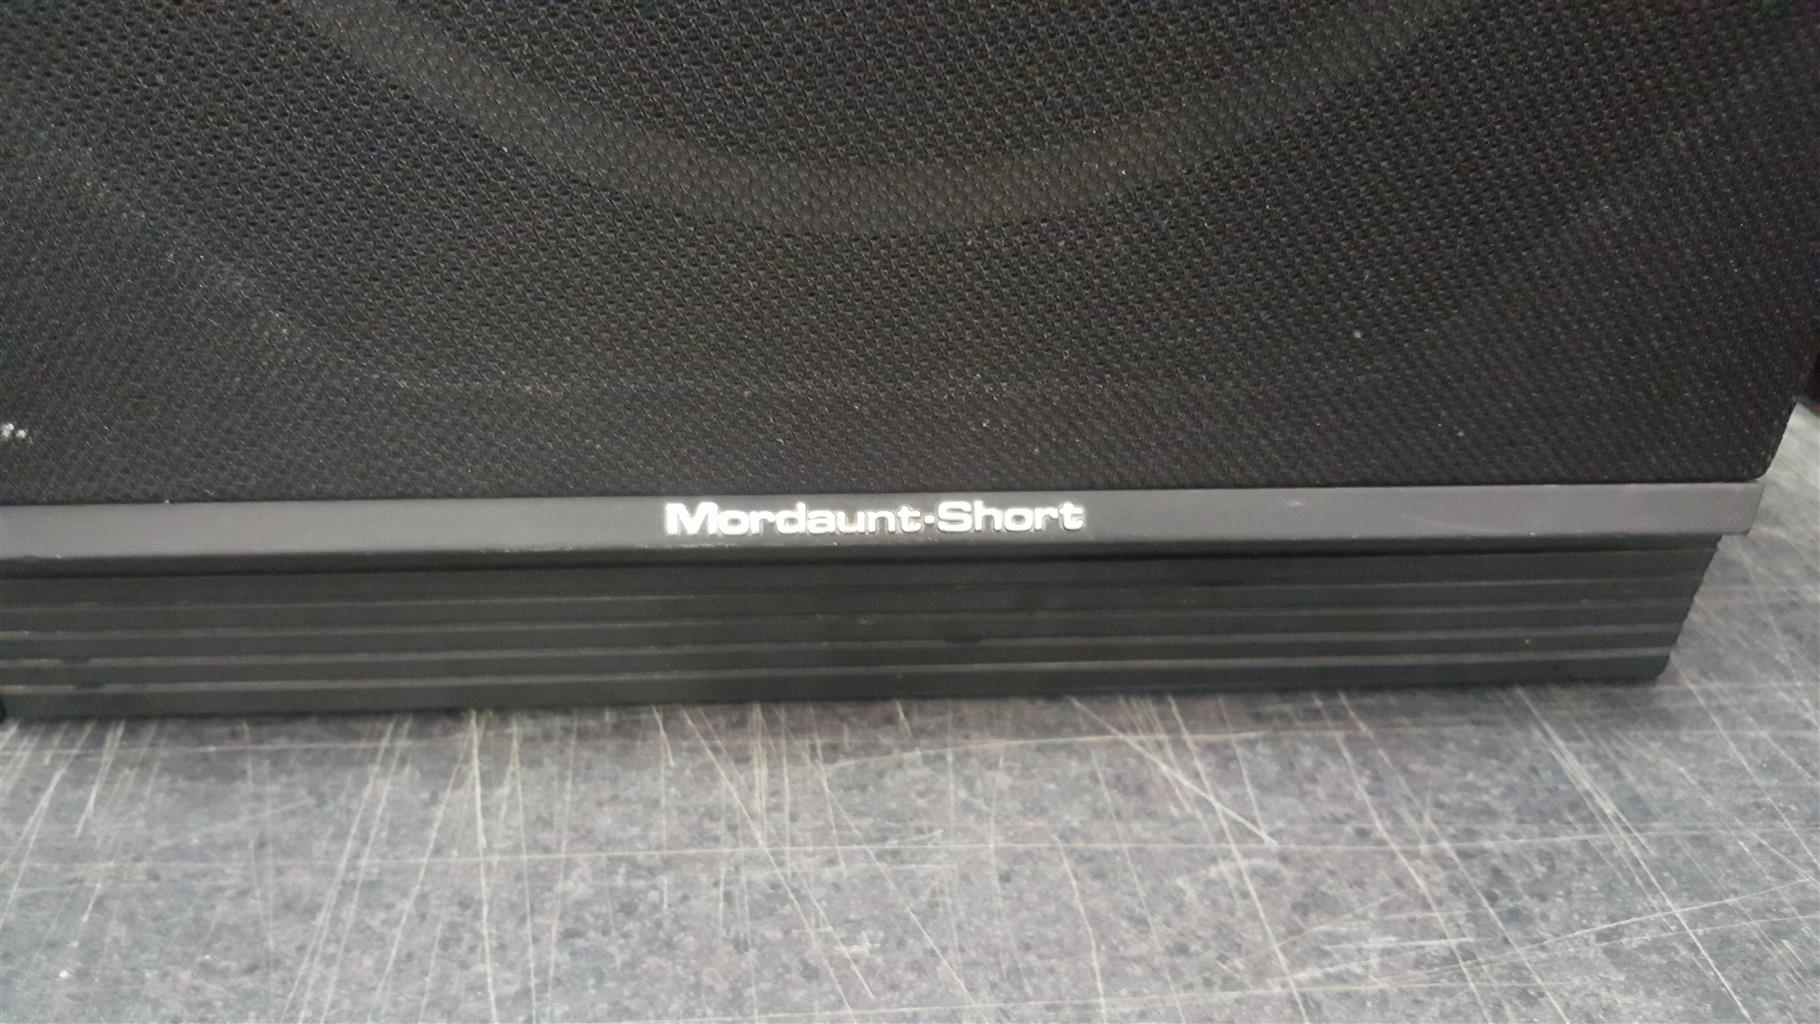 Bookshelf Speakers Mordaunt-short MS25Ti